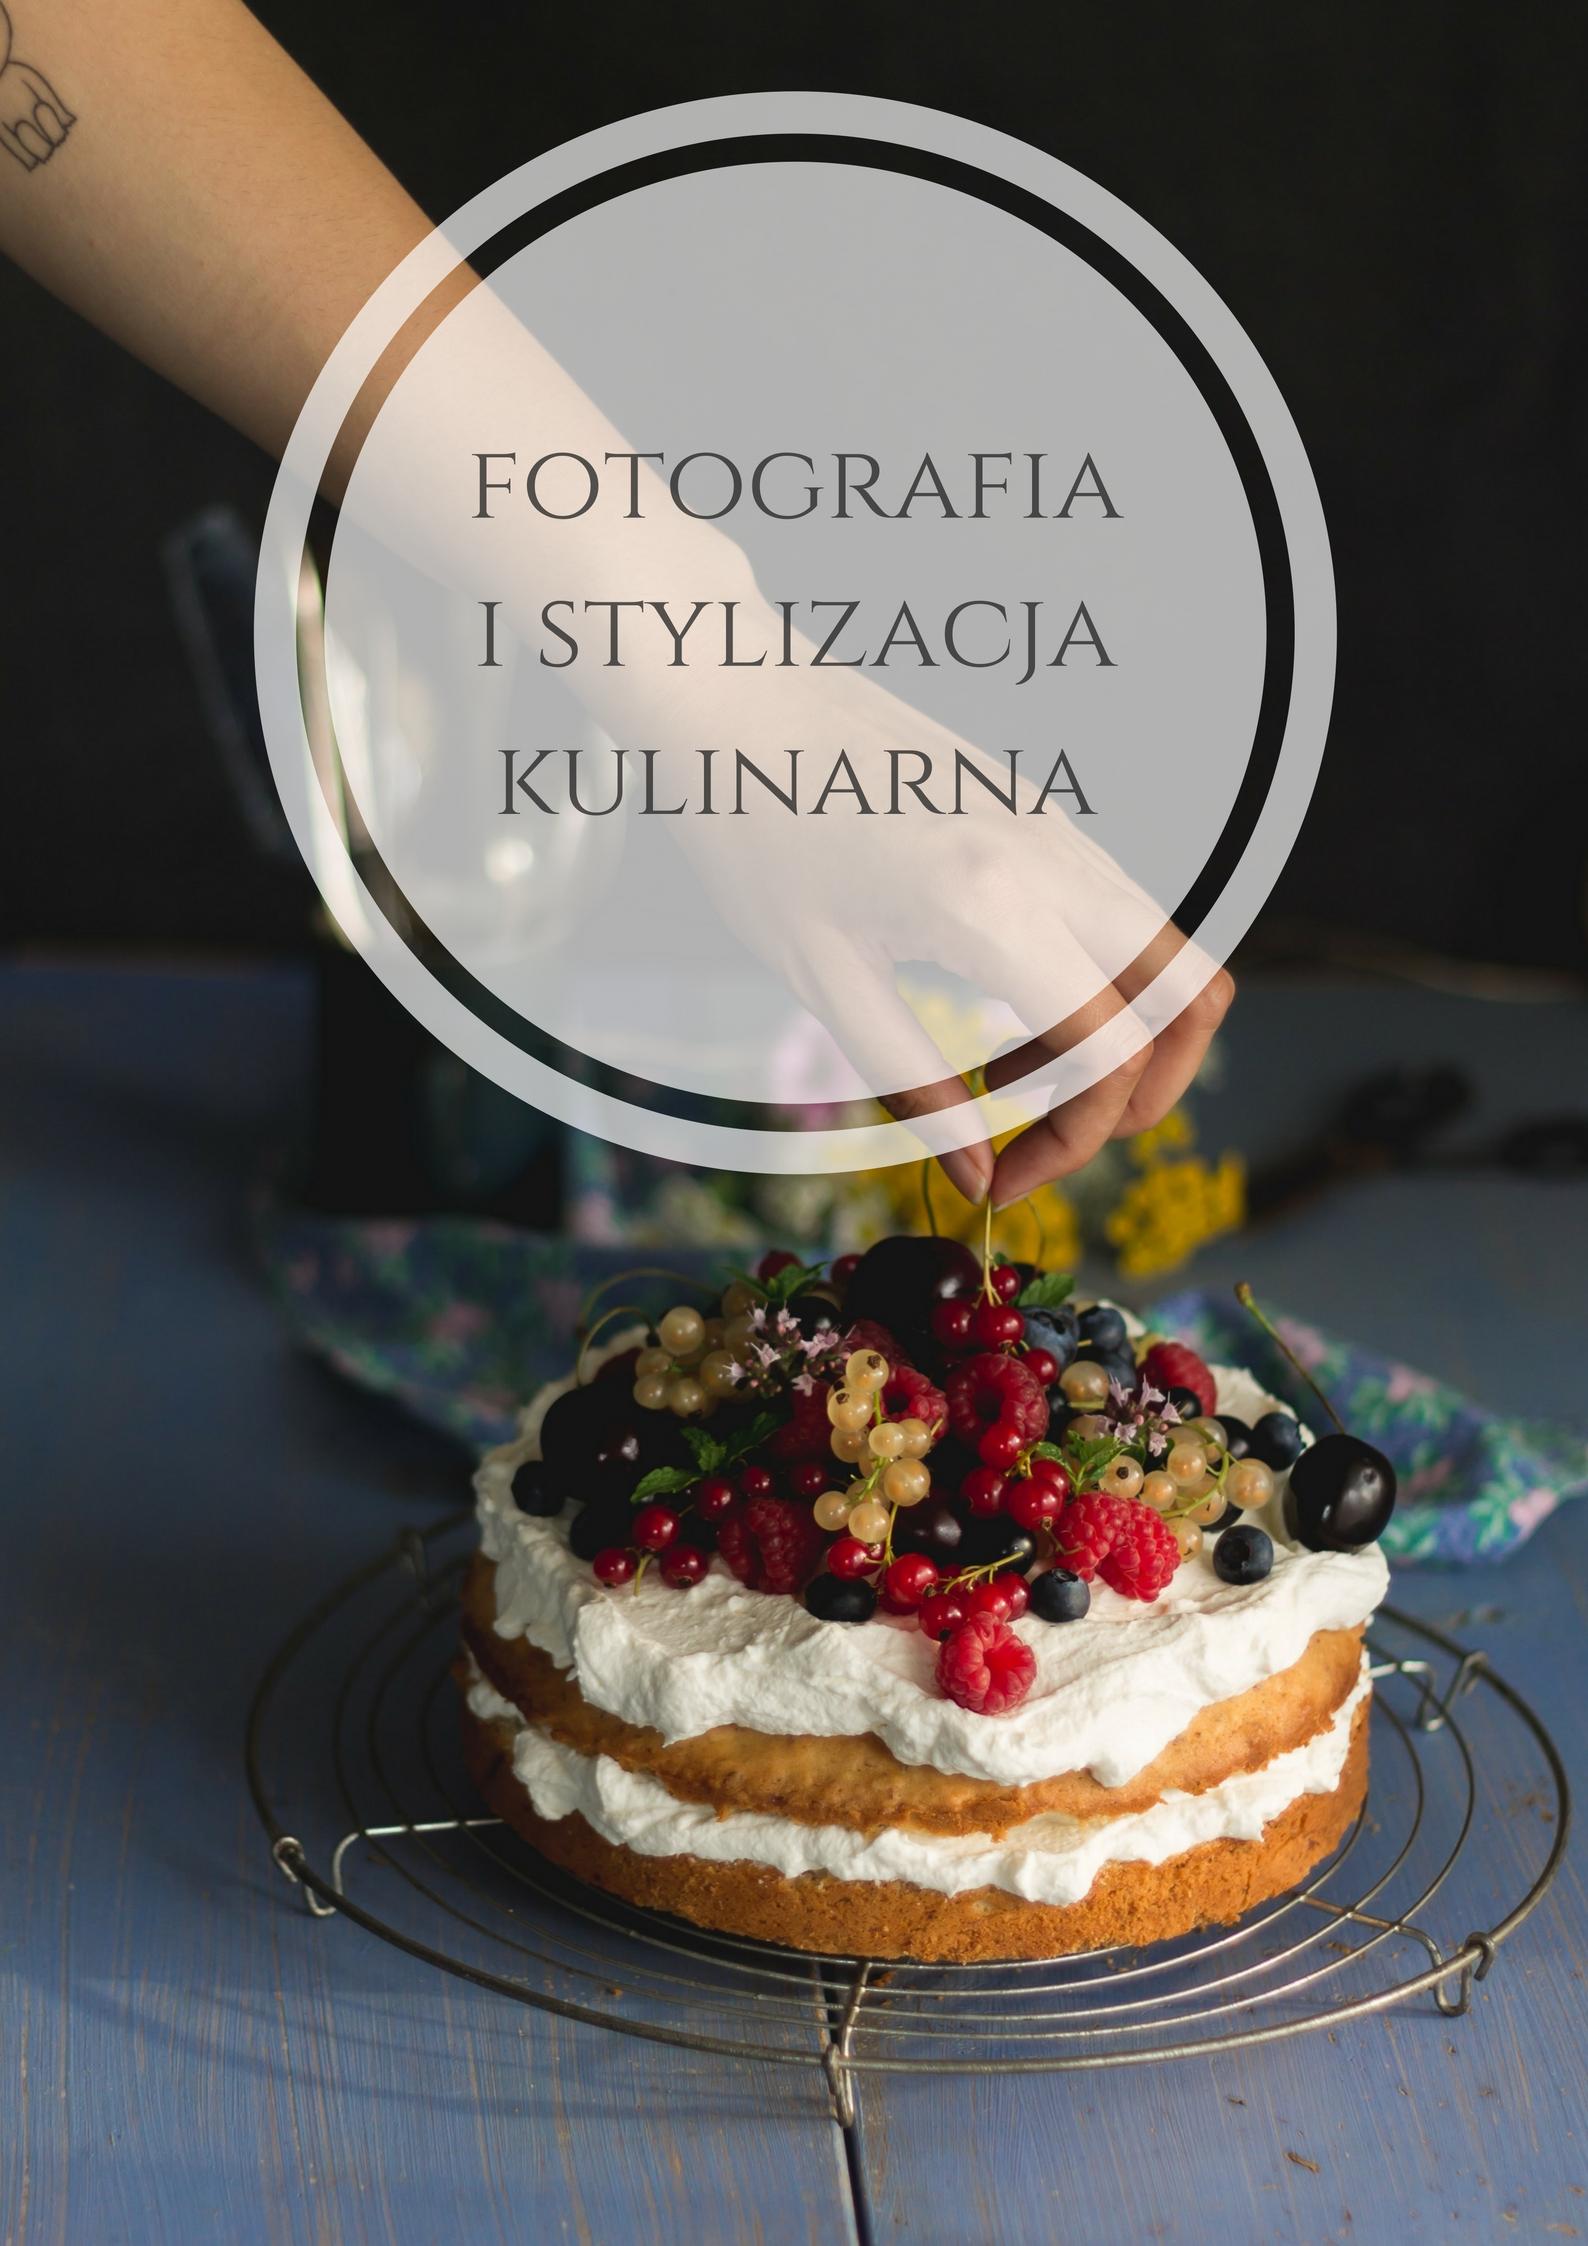 fotografia i stylizacja kulinarna